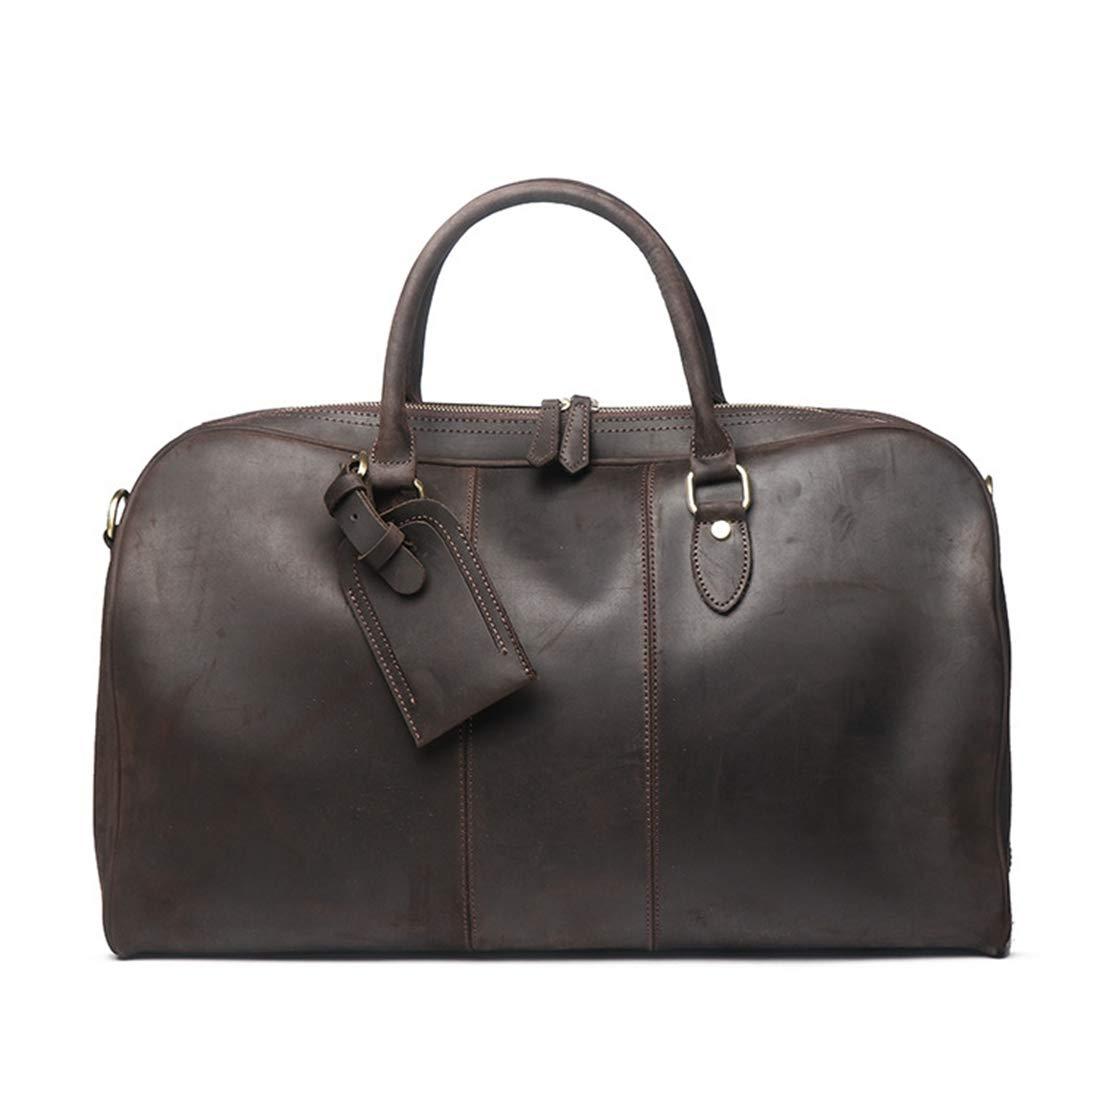 RABILTY Mens Leather Travel Bag Crazy Horseskin Shoulder Messenger Bag Large Capacity Duffel Bag Color : Dark Brown